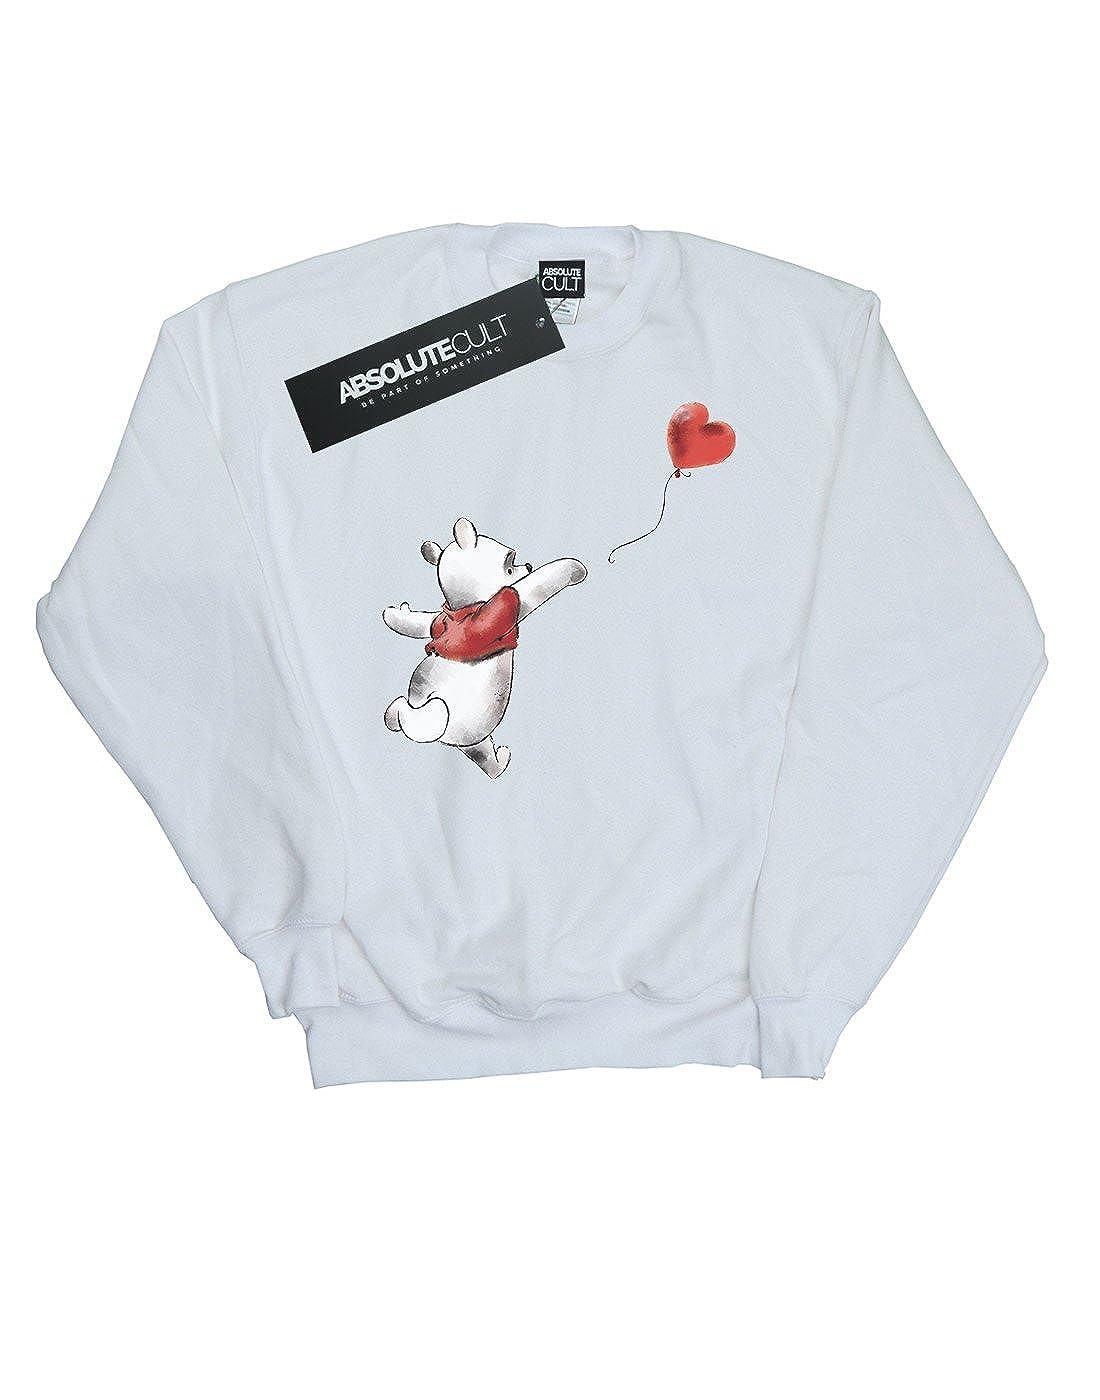 Disney Girls Winnie The Pooh Balloon Sweatshirt